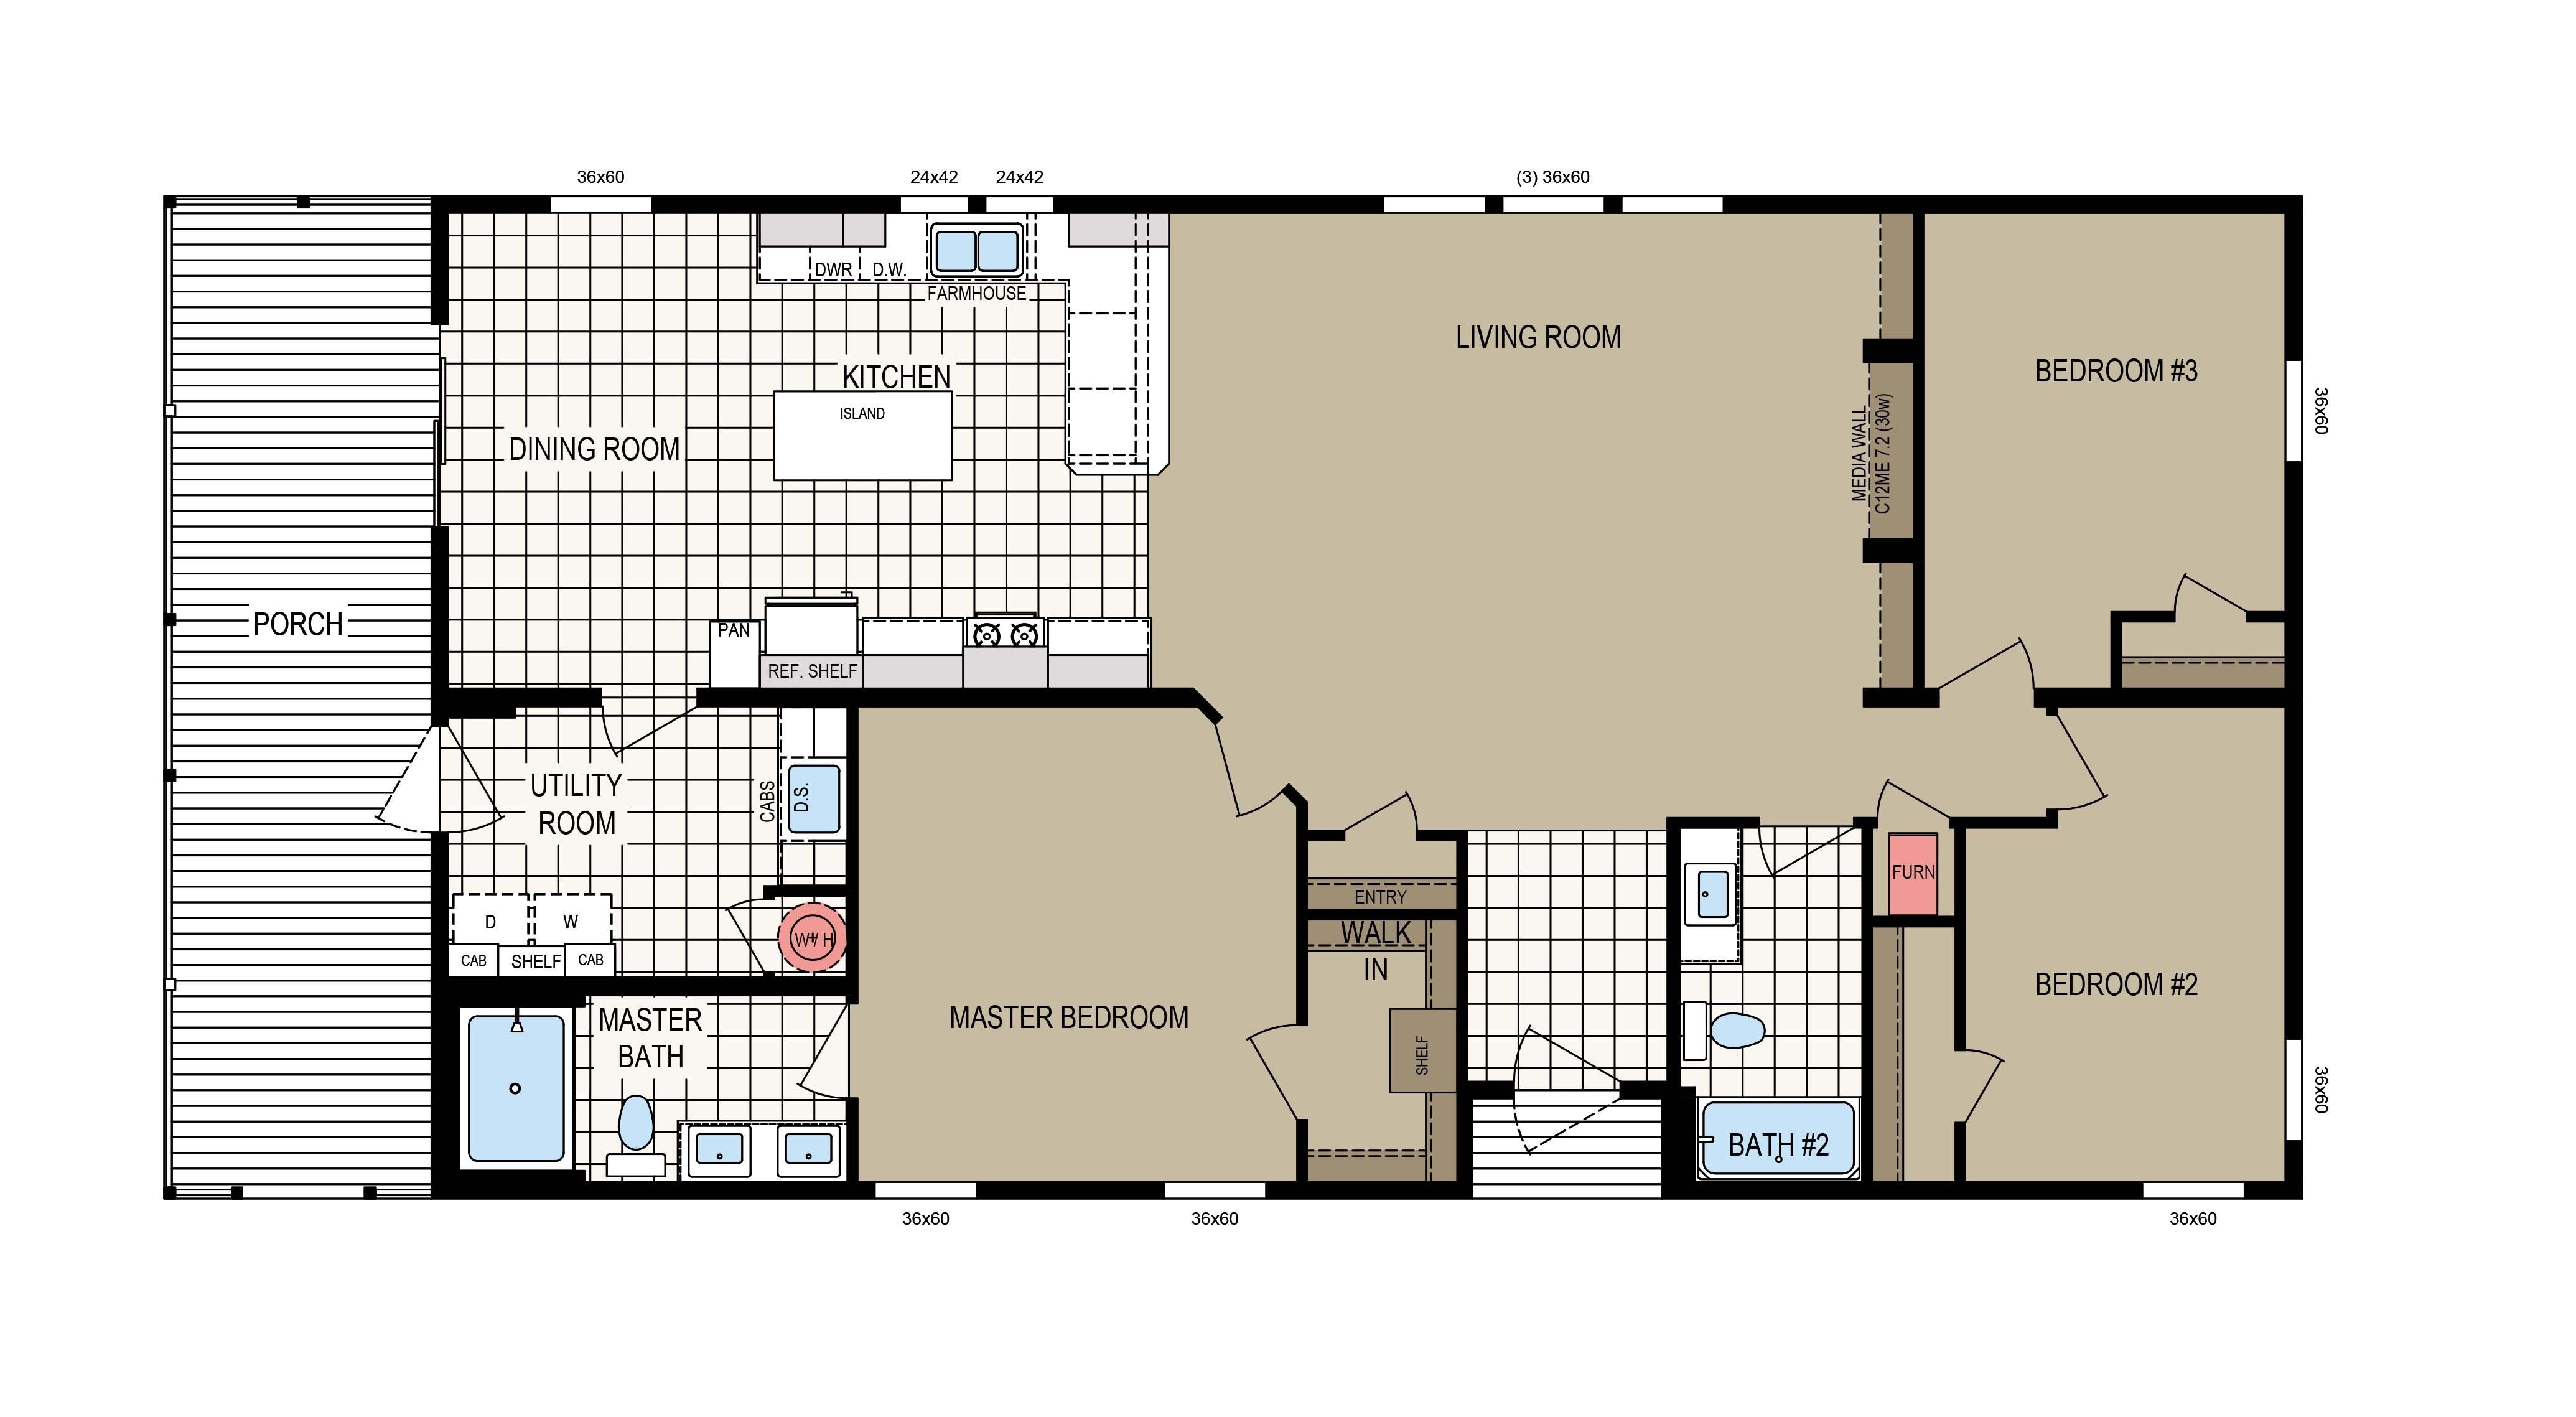 floorplan image for unit 312